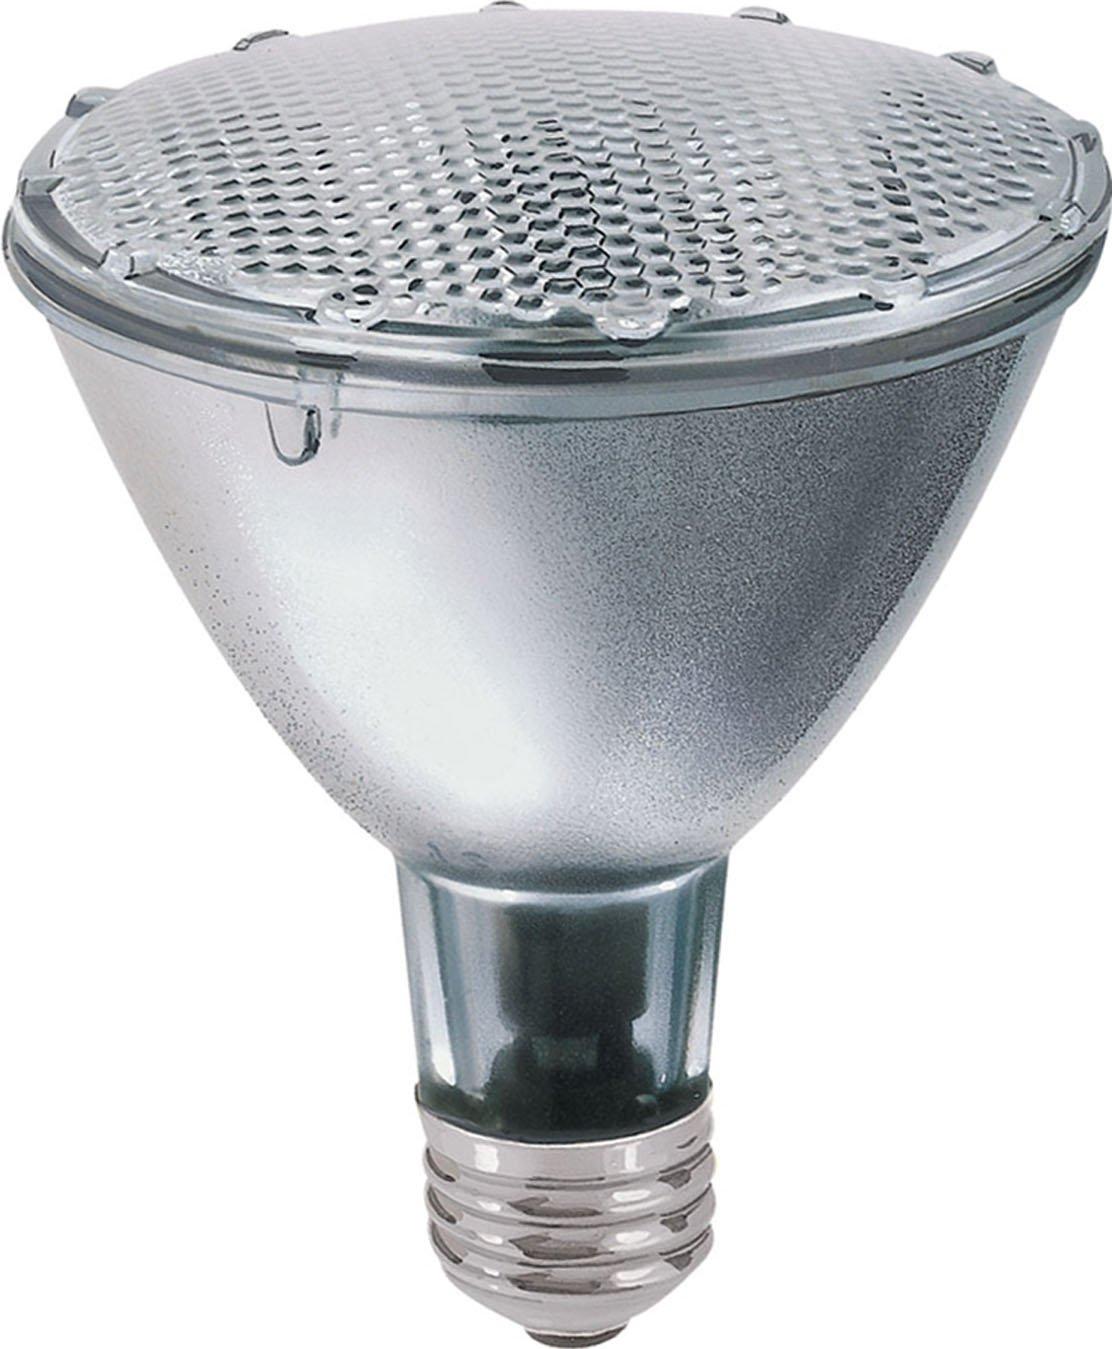 GE Lighting 76126 Energy-Efficient Halogen 48-Watt (75-watt replacement) 840-Lumen PAR30 Floodlight Bulb with Medium Base, 1-Pack